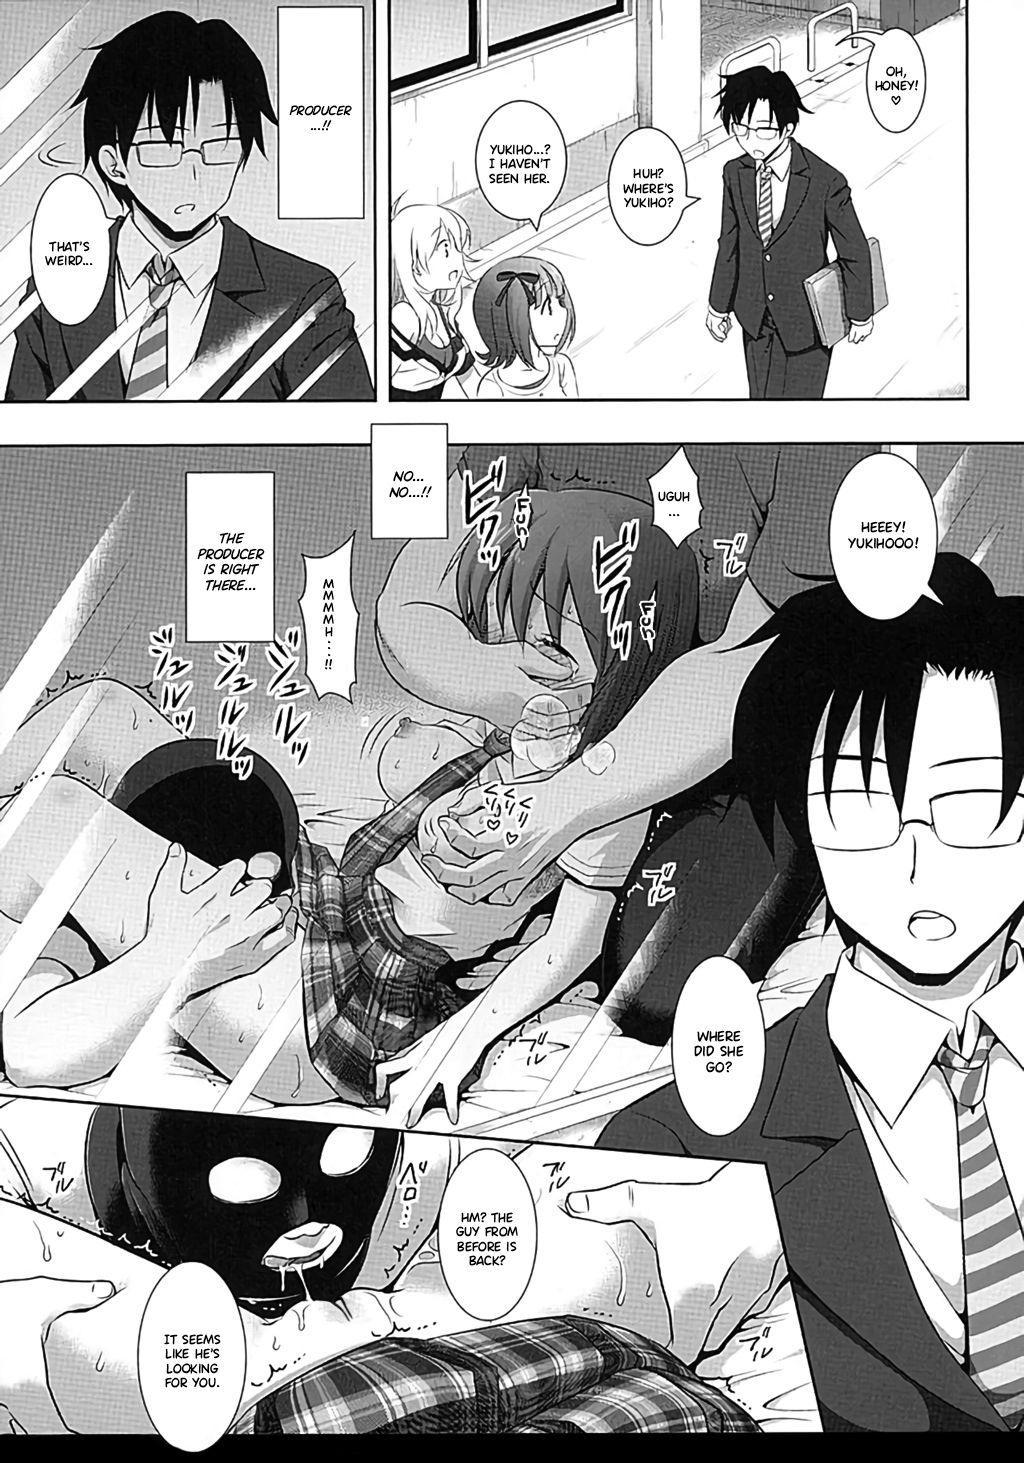 Idol Ryoujoku 17 Yukiho Magic Mirror Gou 8